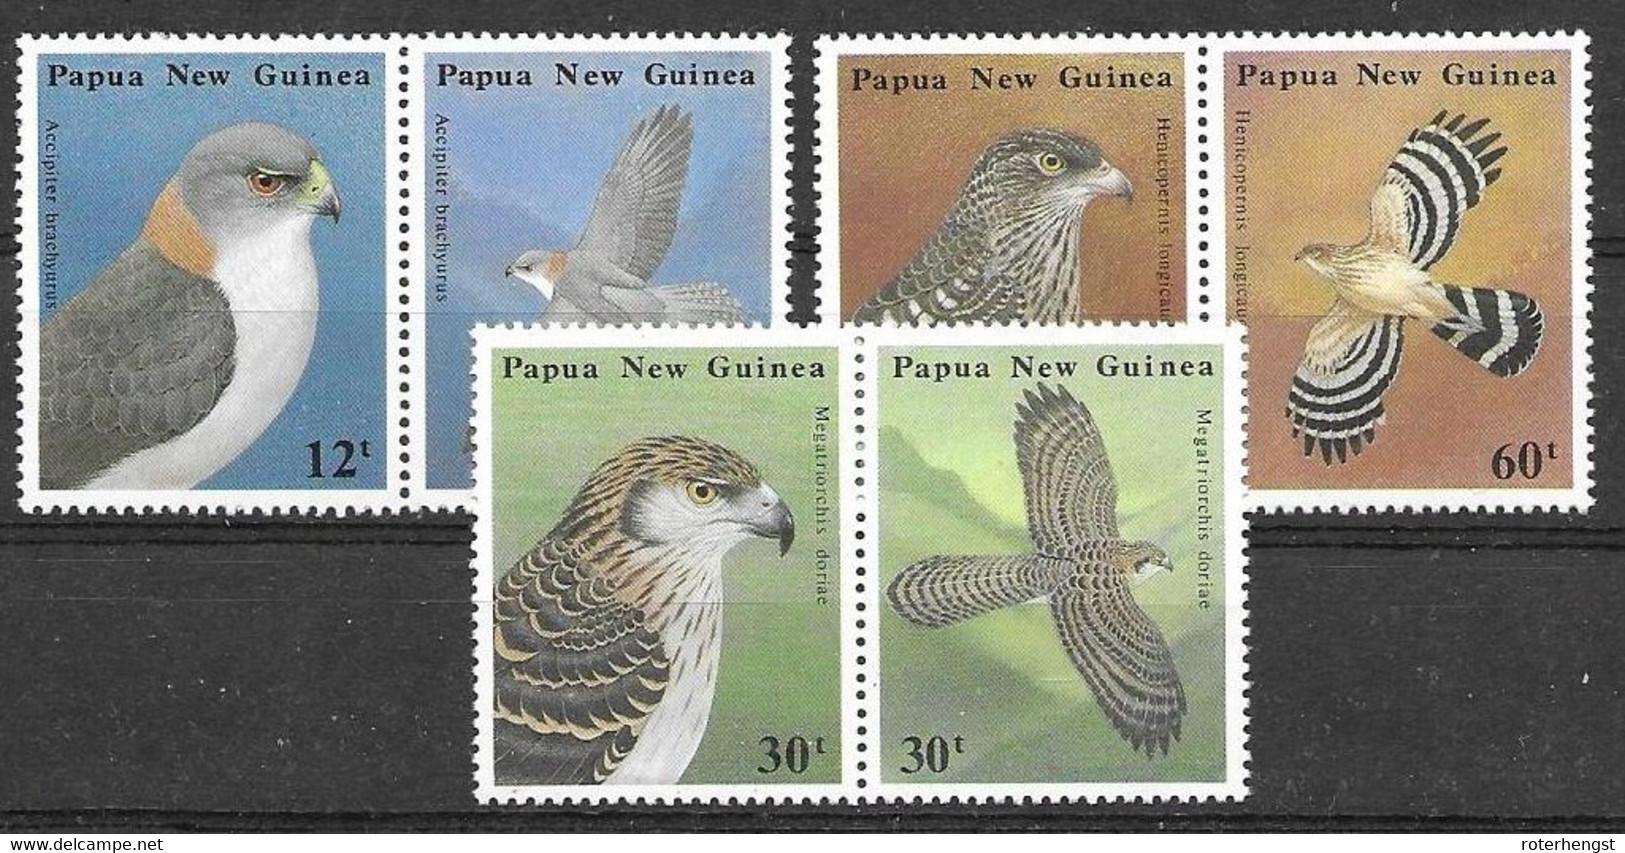 Papua Mnh** Complete Birds Set 8 Euros 1985 - Ohne Zuordnung